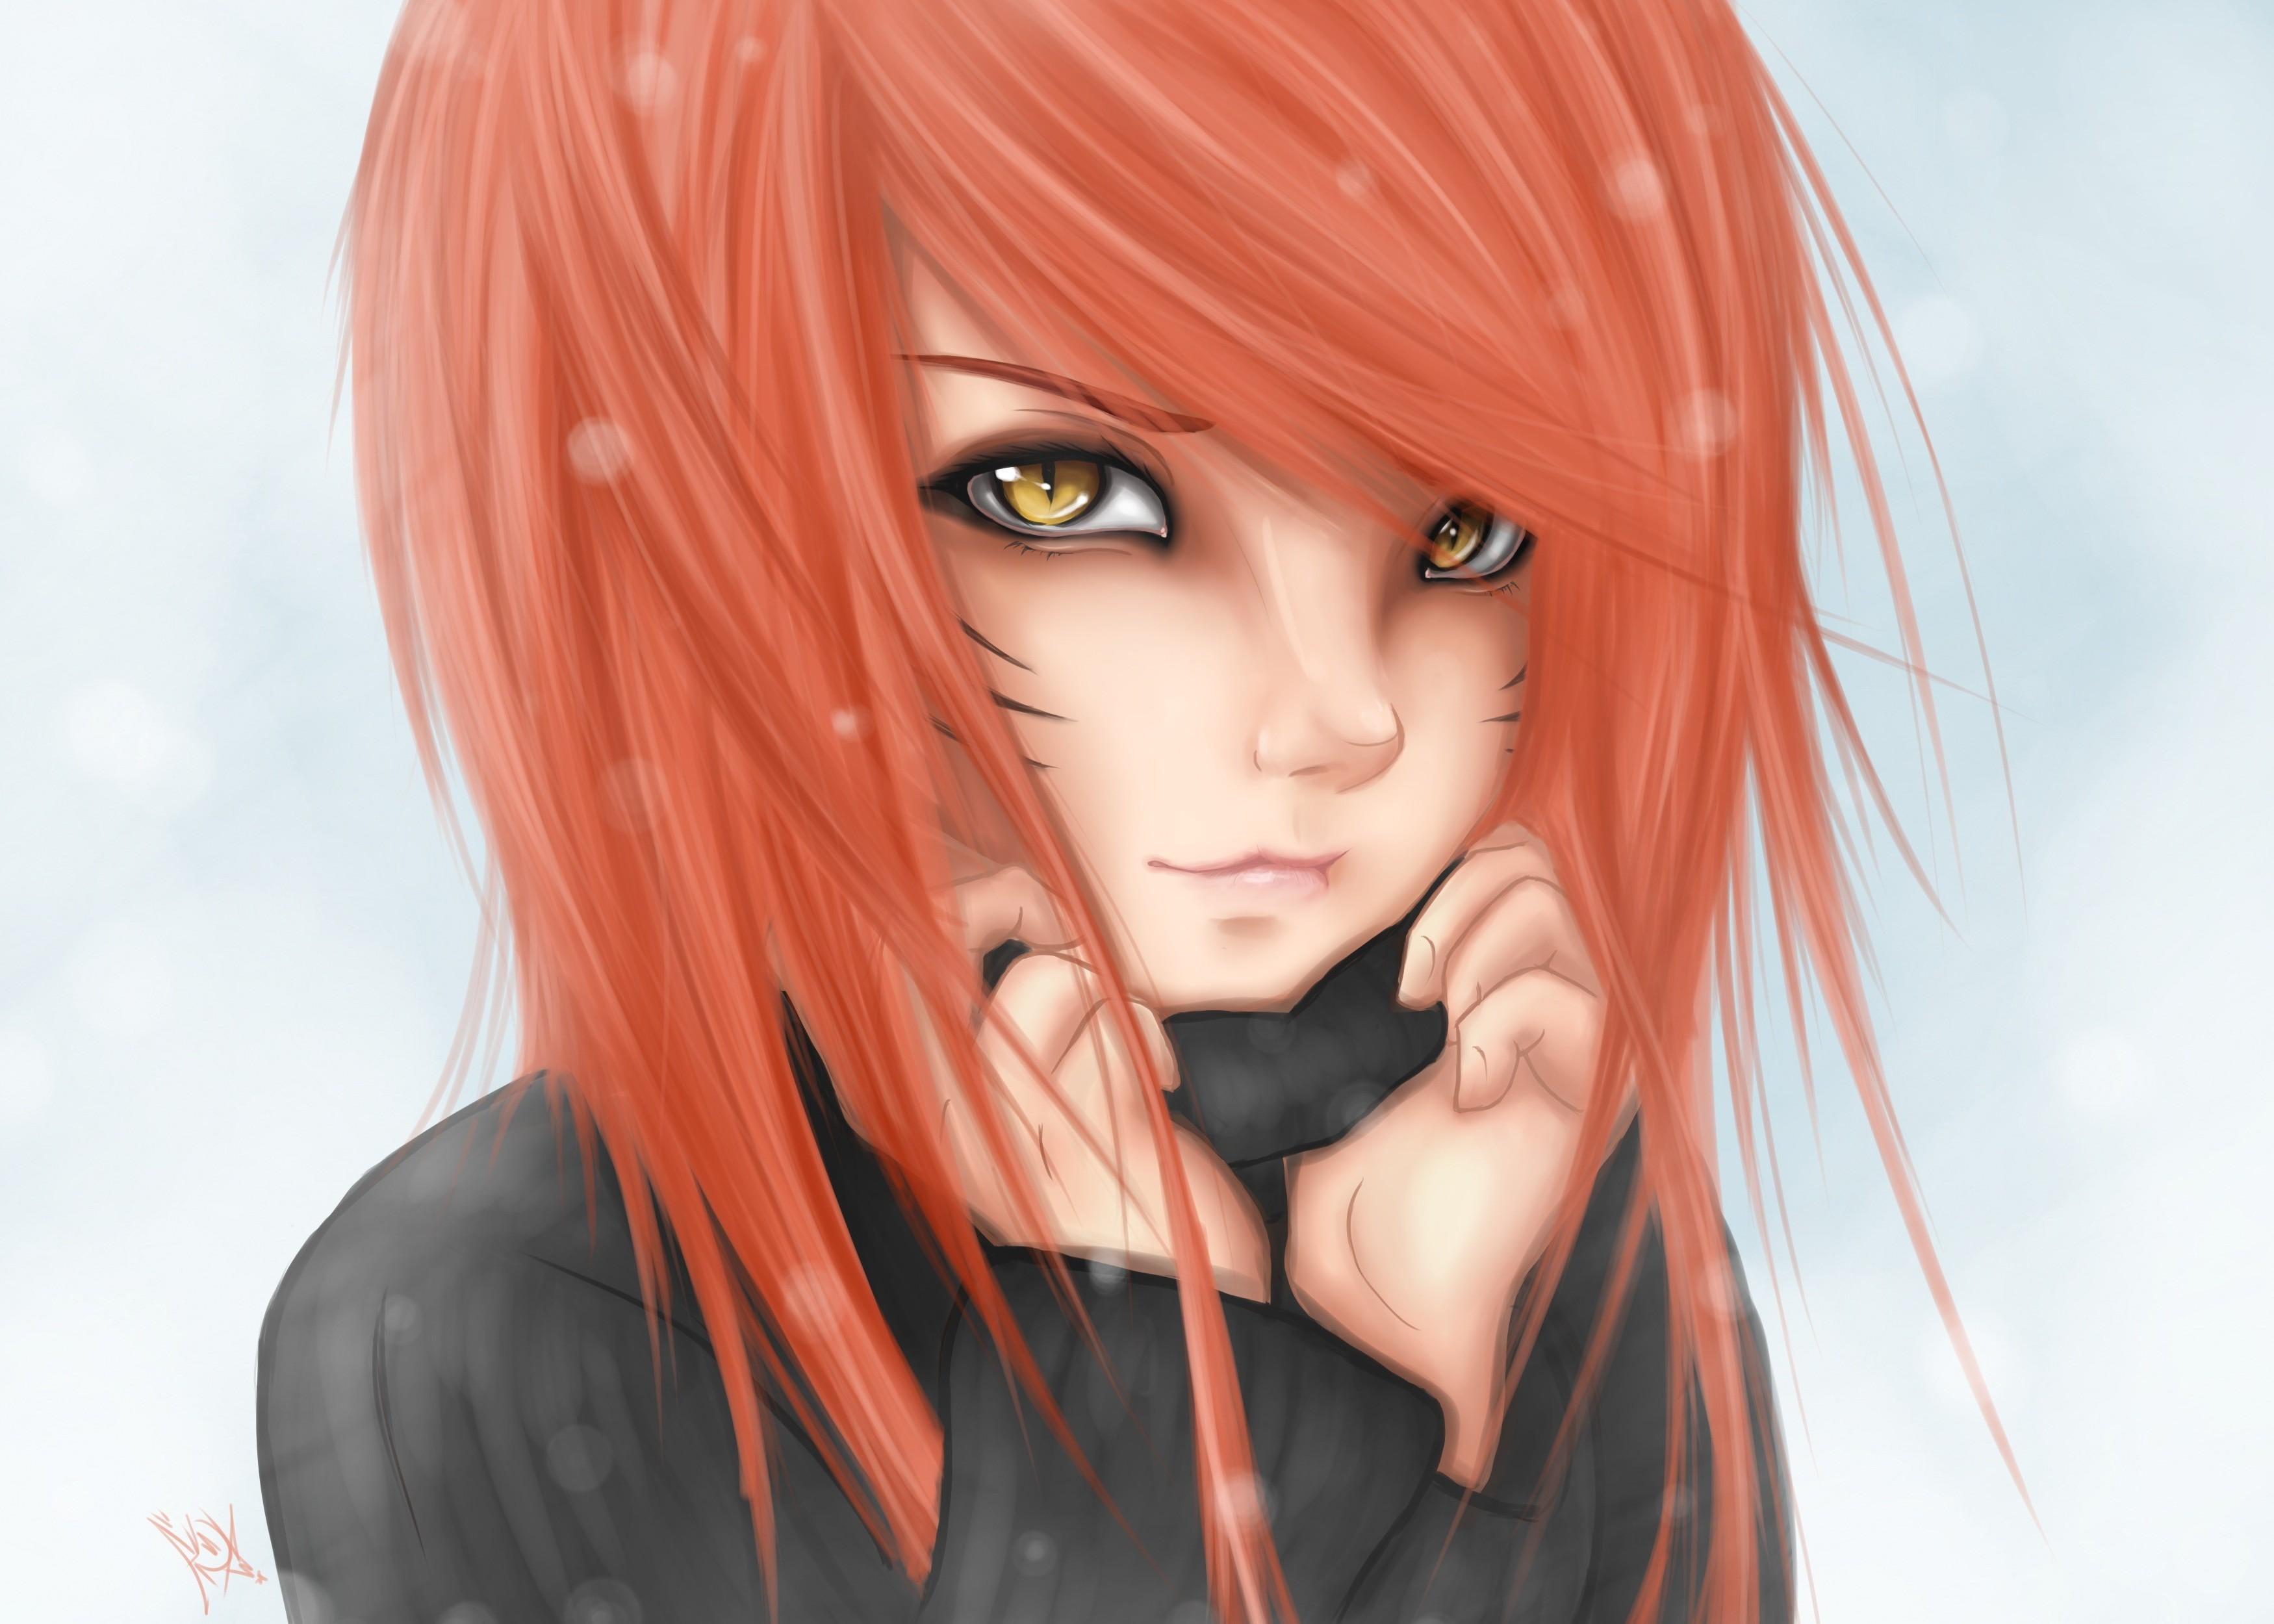 eyes Anime girl brown hair red